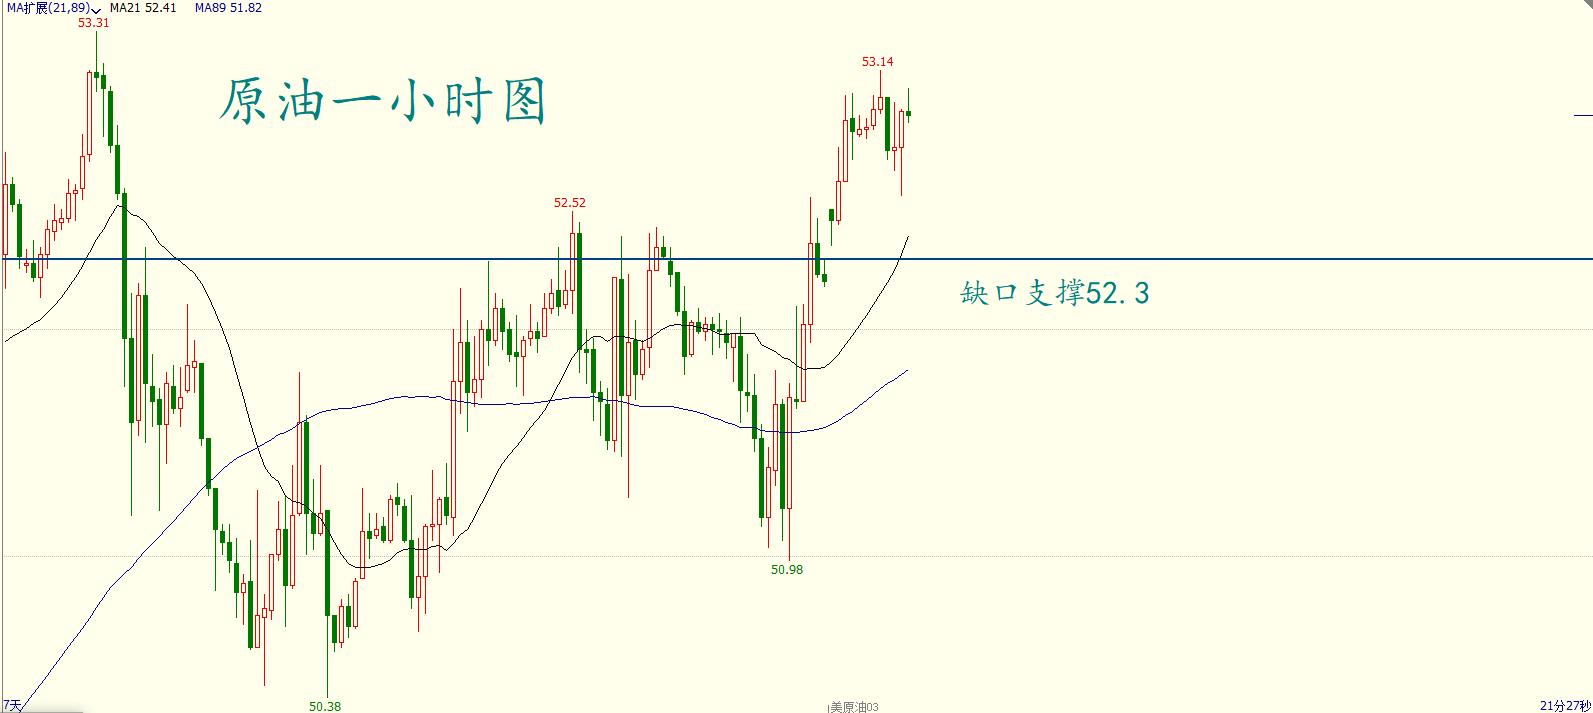 【1.18】OPEC勤奋推进油价重回正轨,原油近期思绪